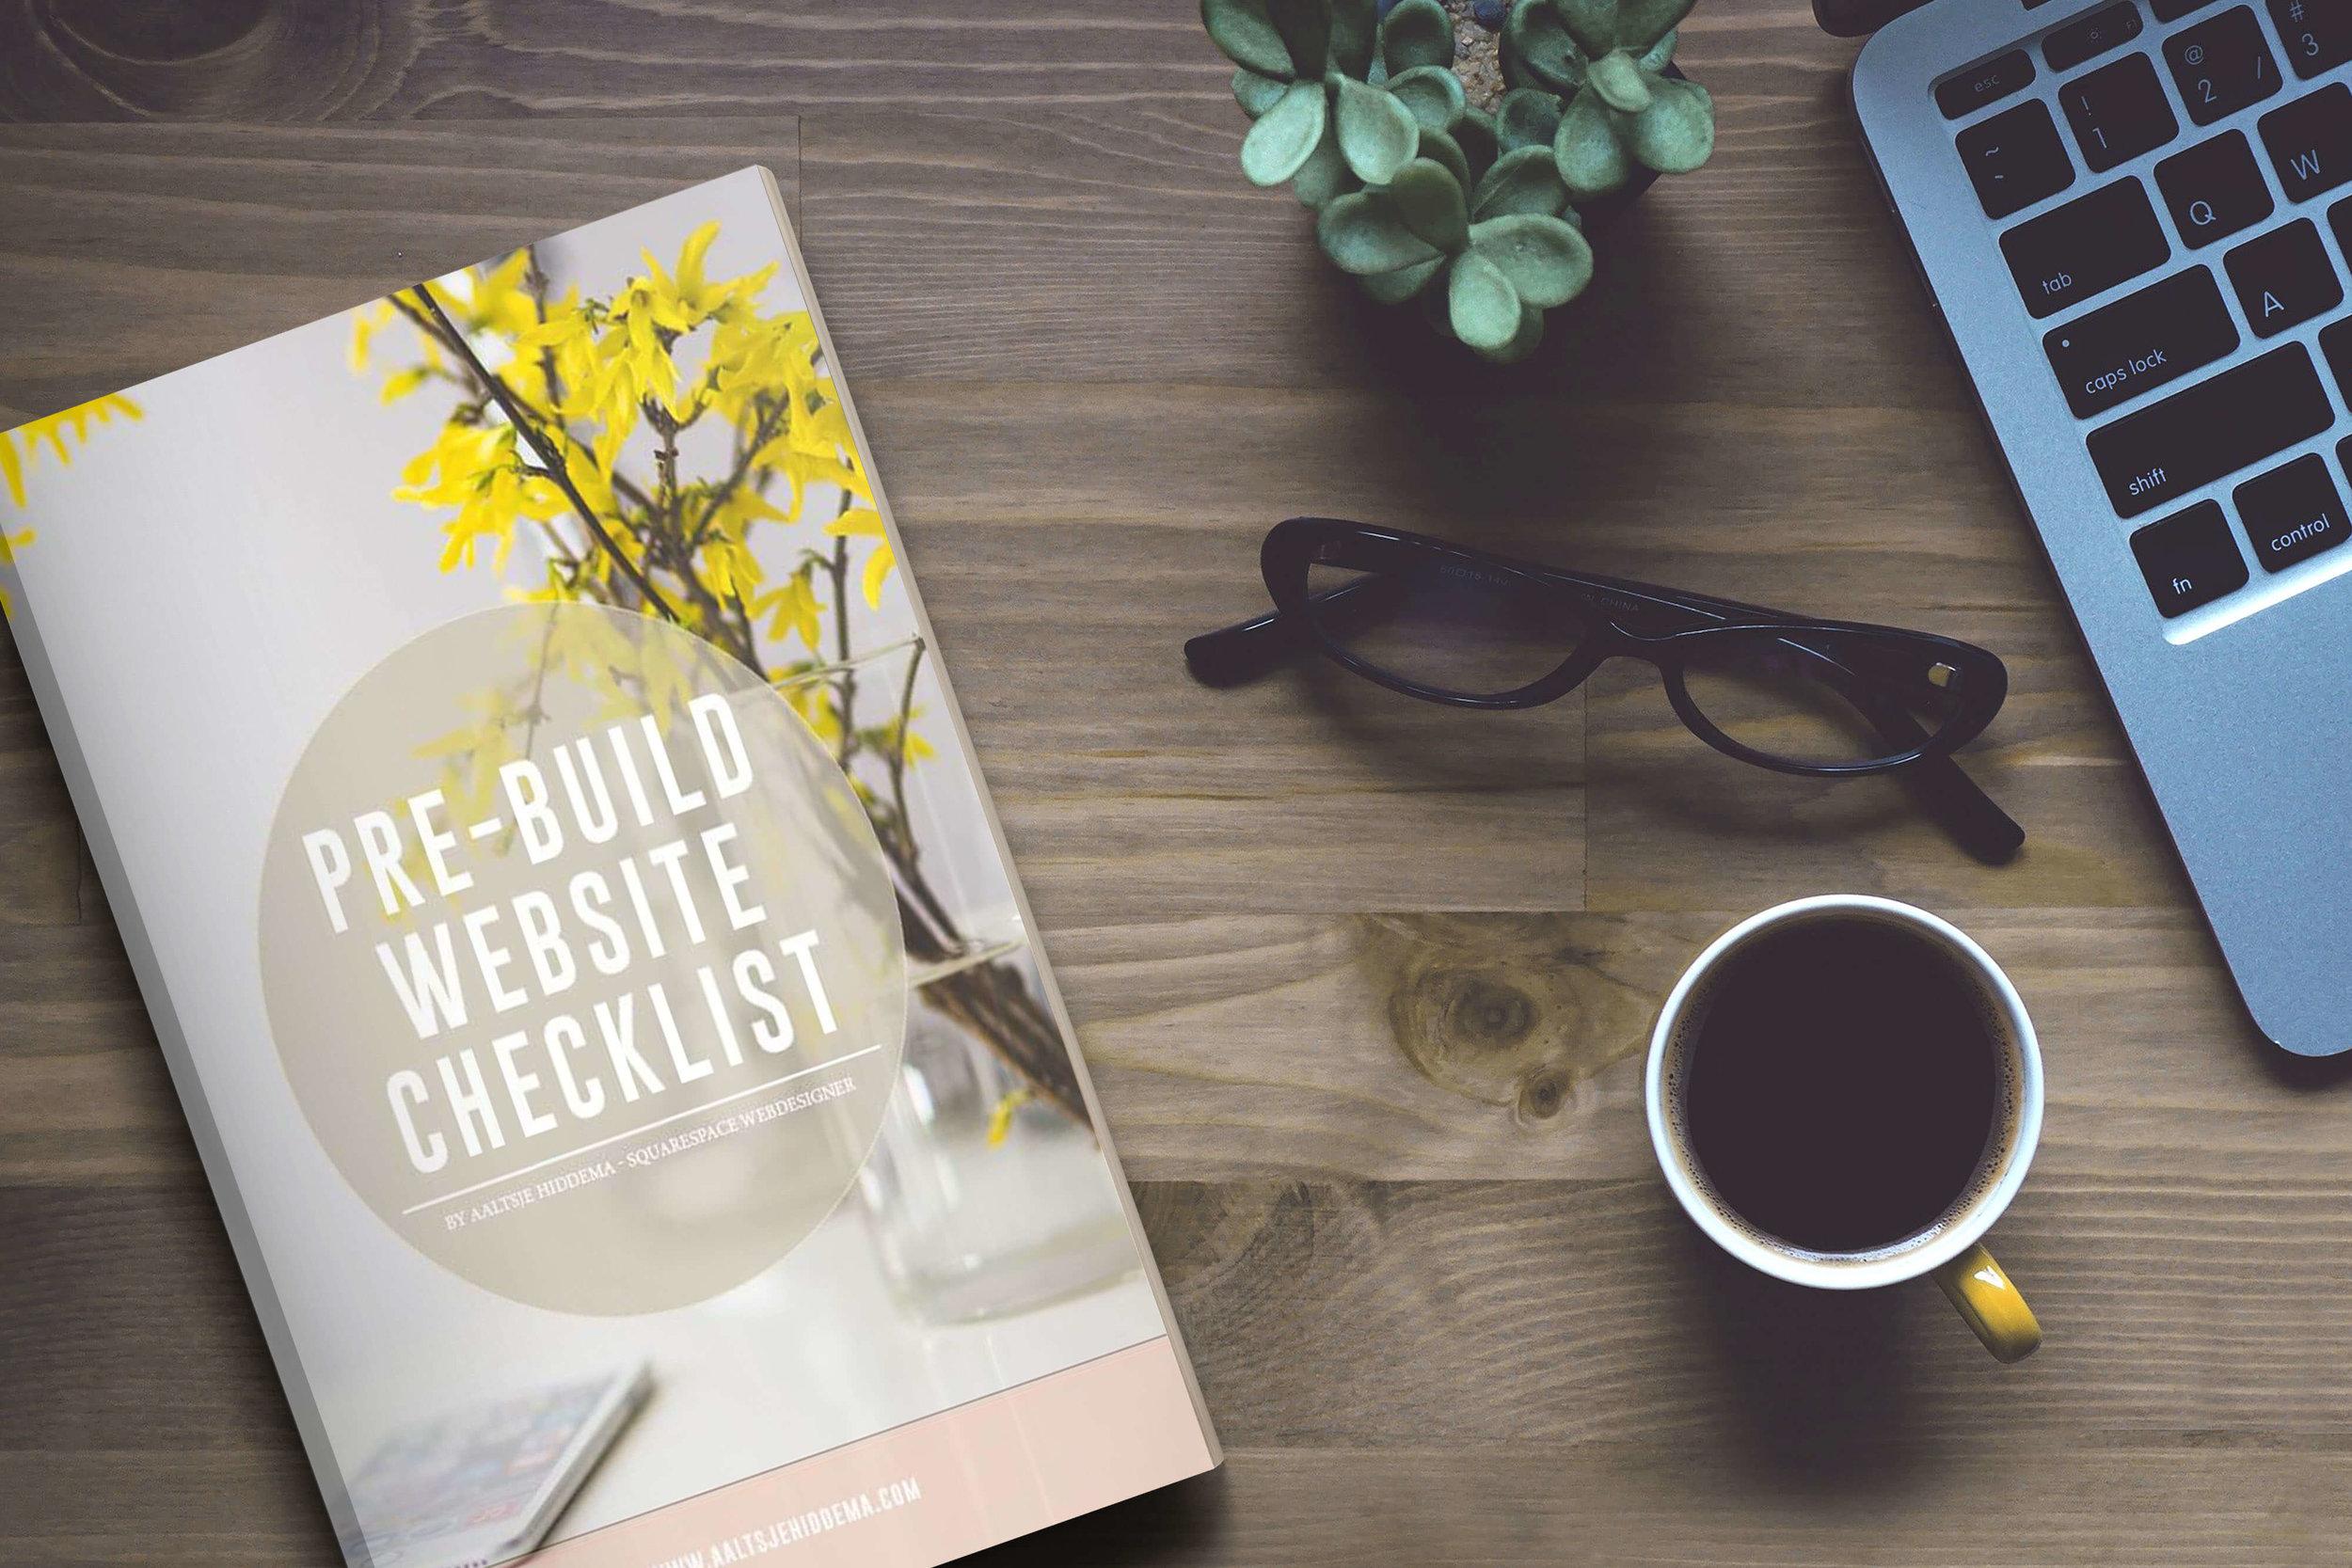 Pre build website checklist on desk.jpg